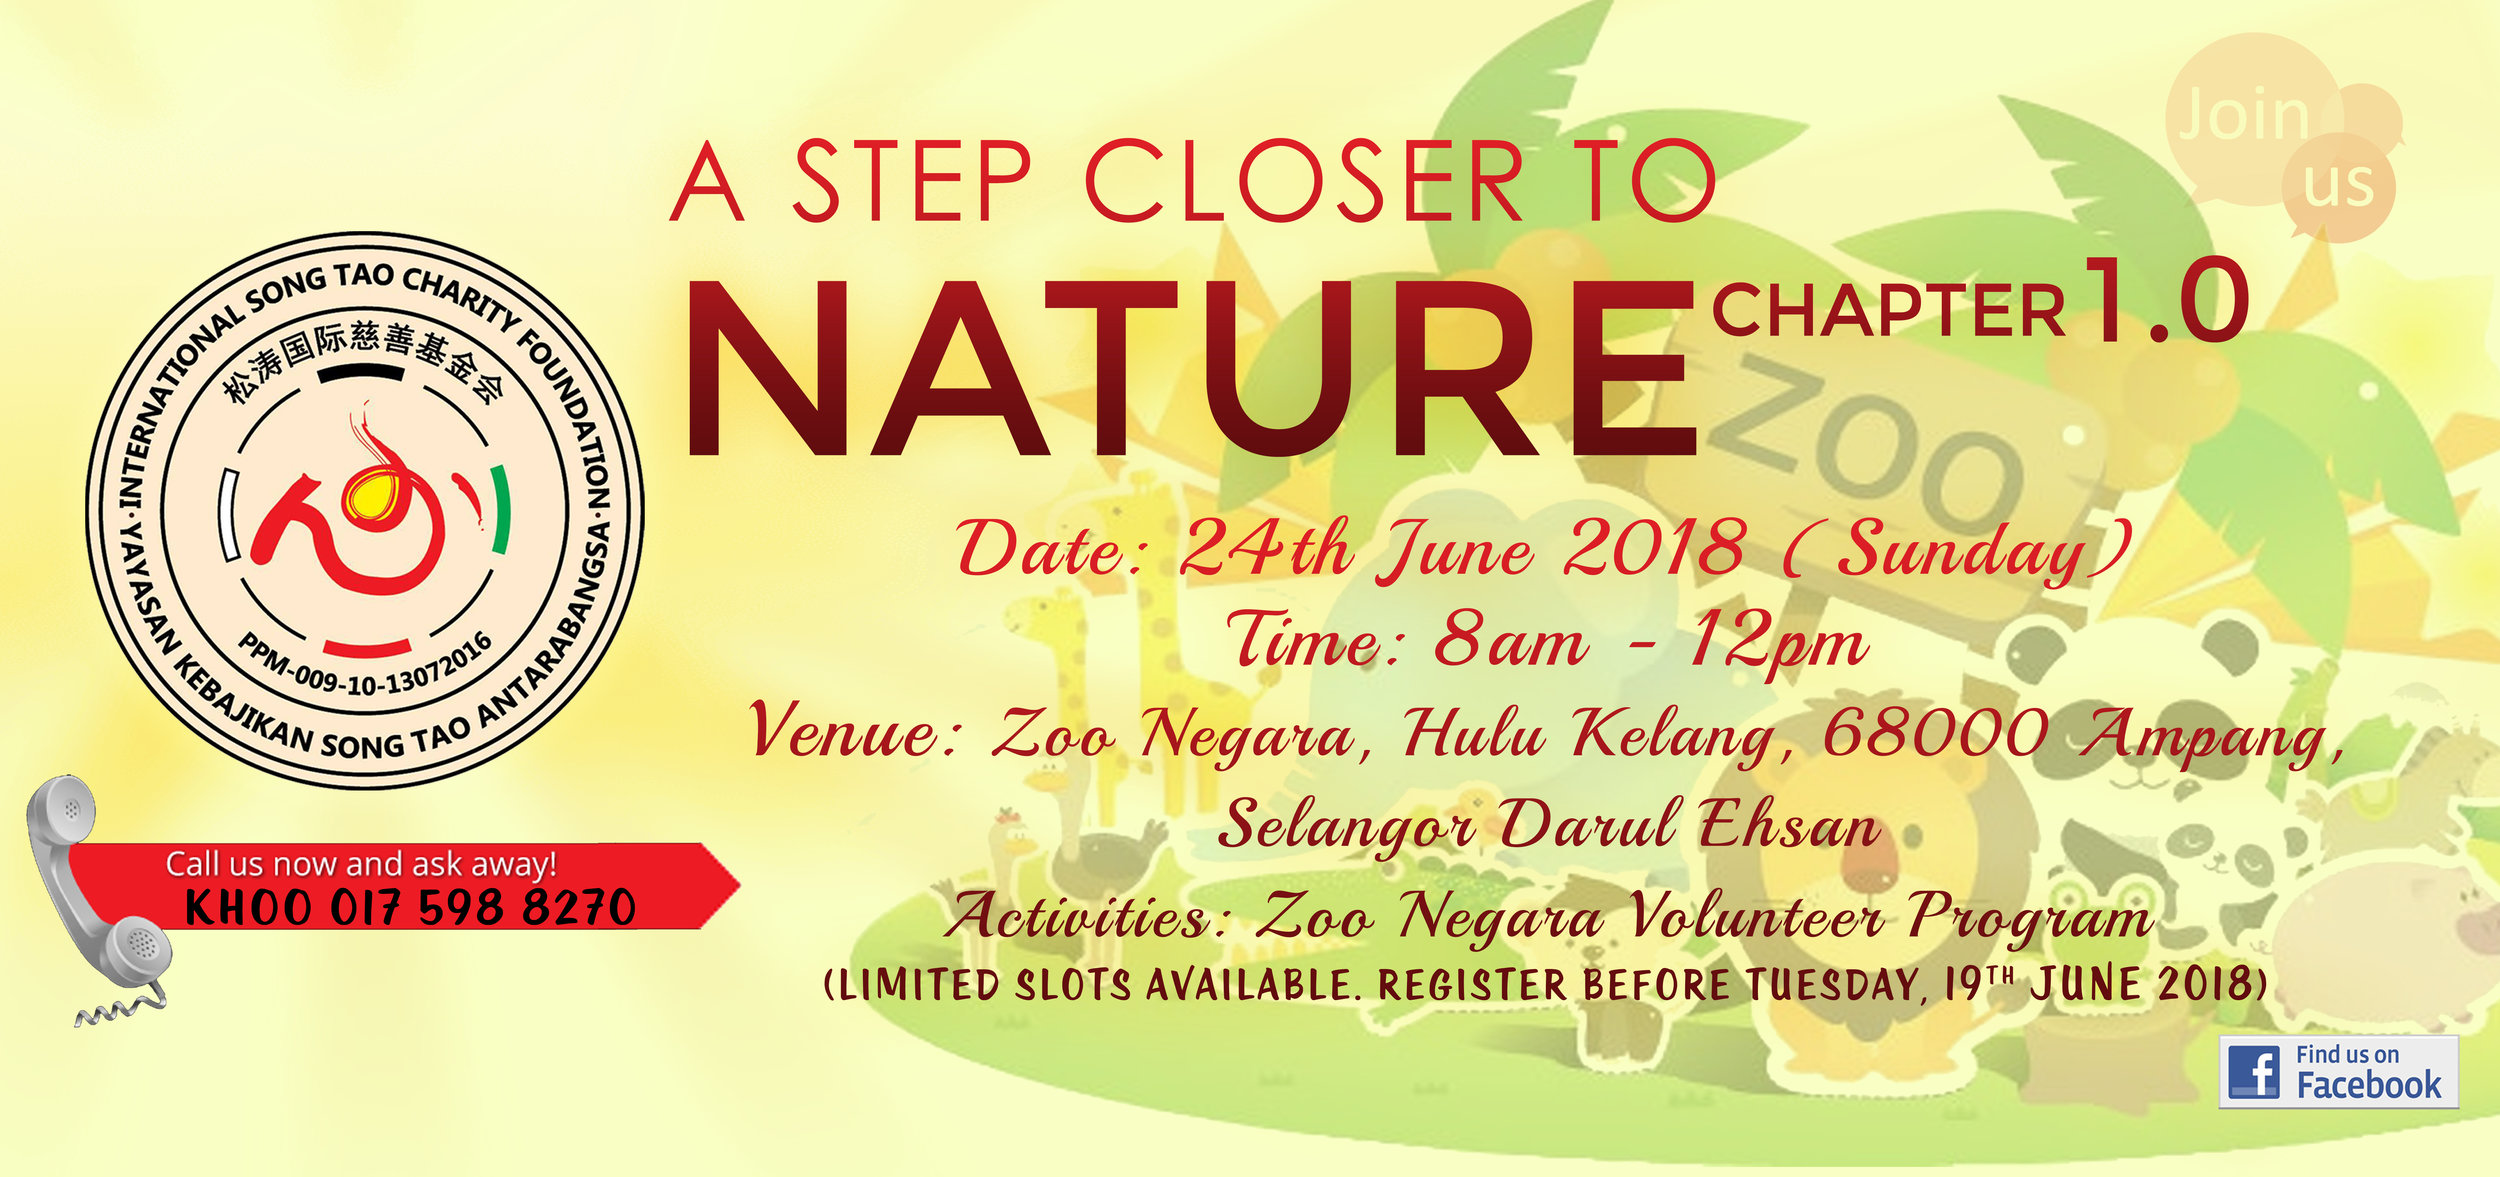 a step closer to nature.jpg